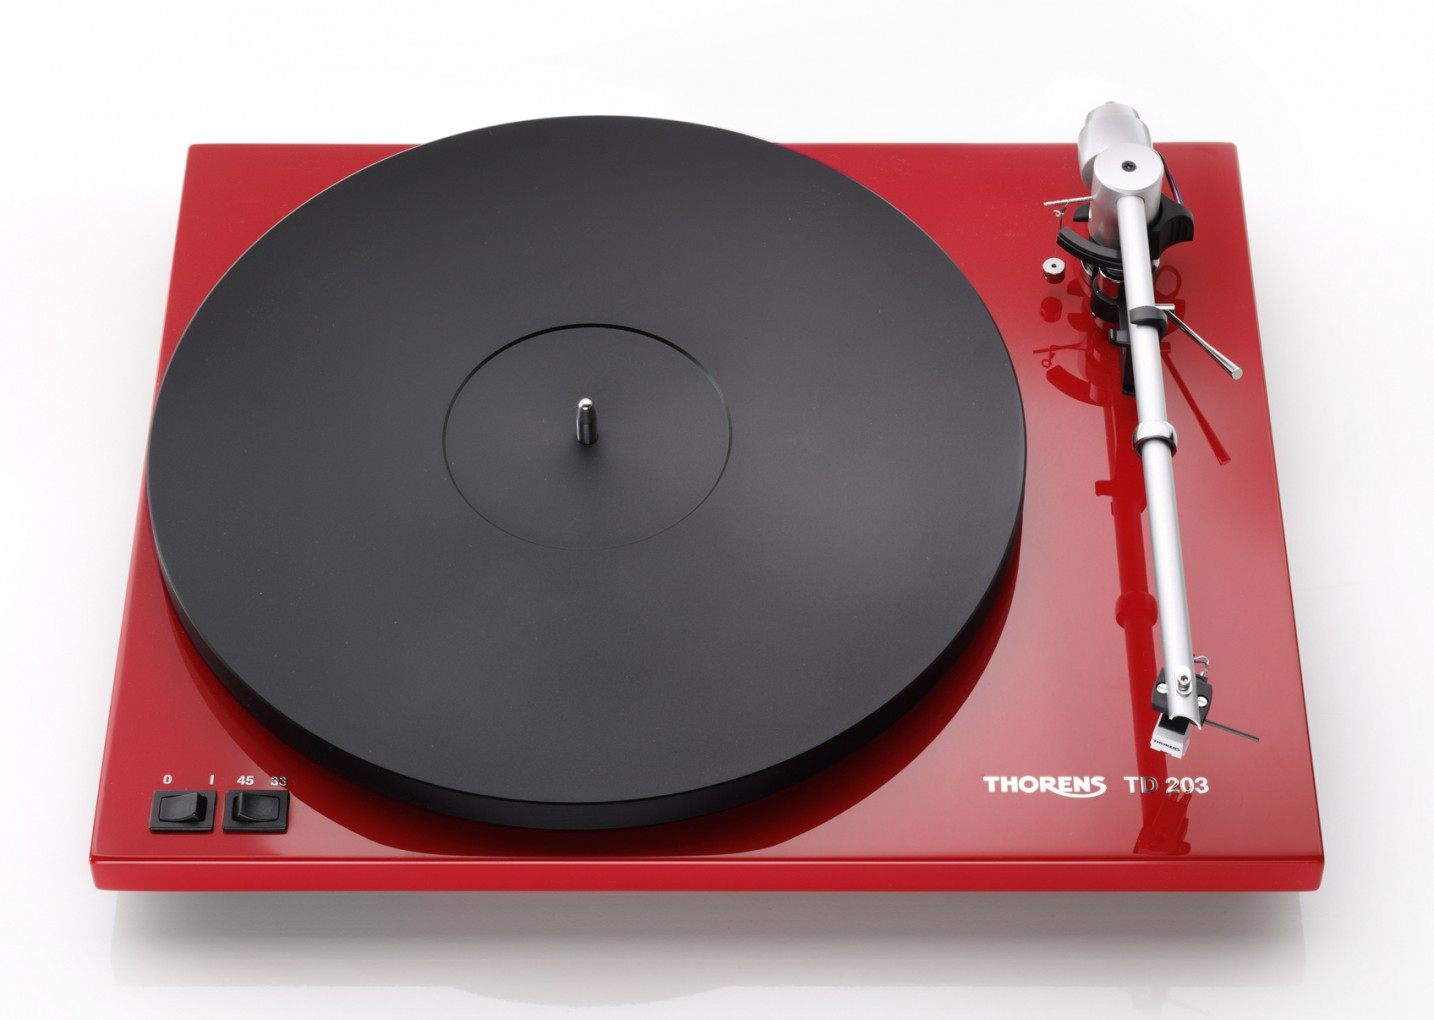 Thorens-TD-203-red-1